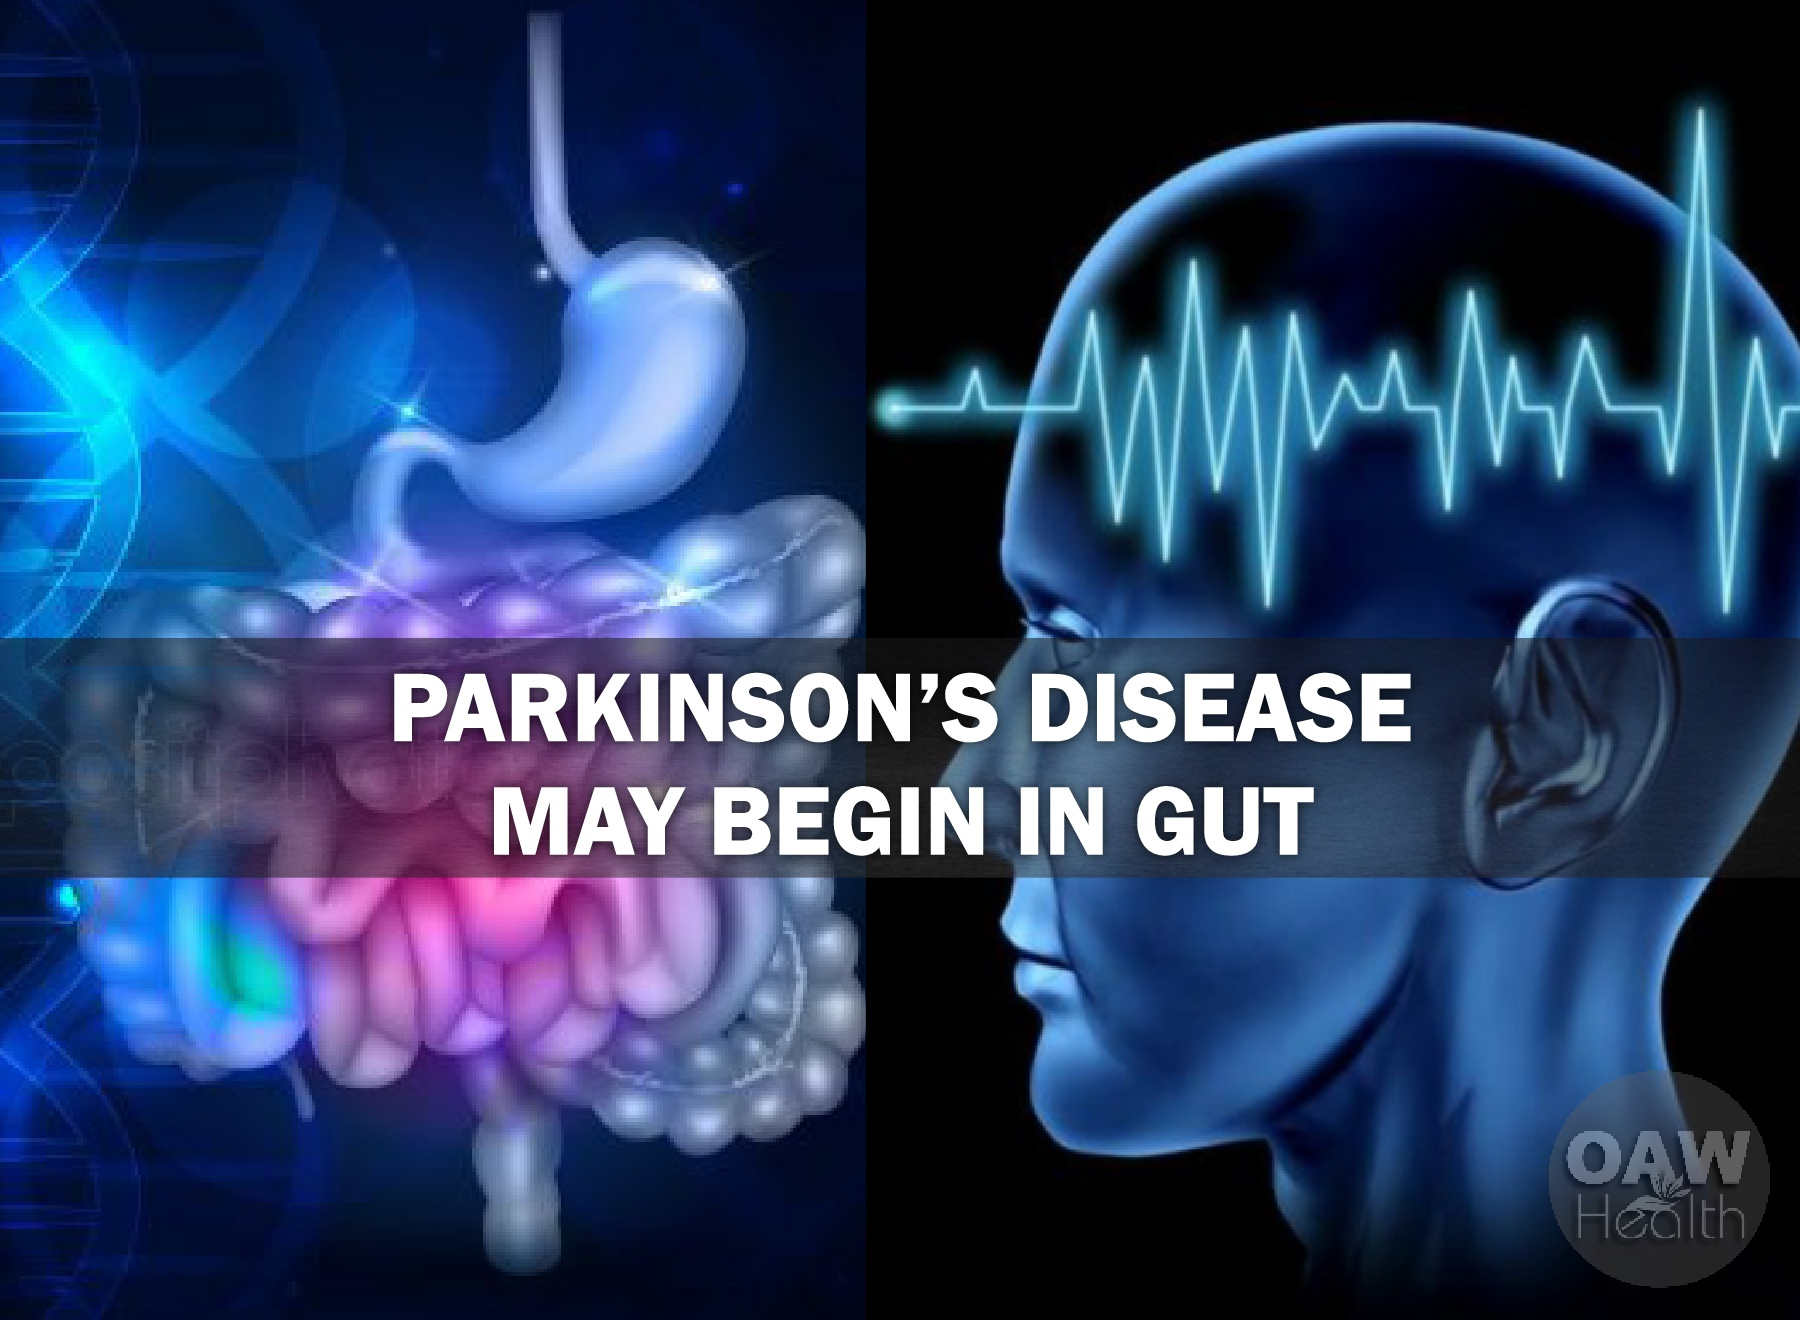 Large Study Parkinson's Disease May Begin in Gut